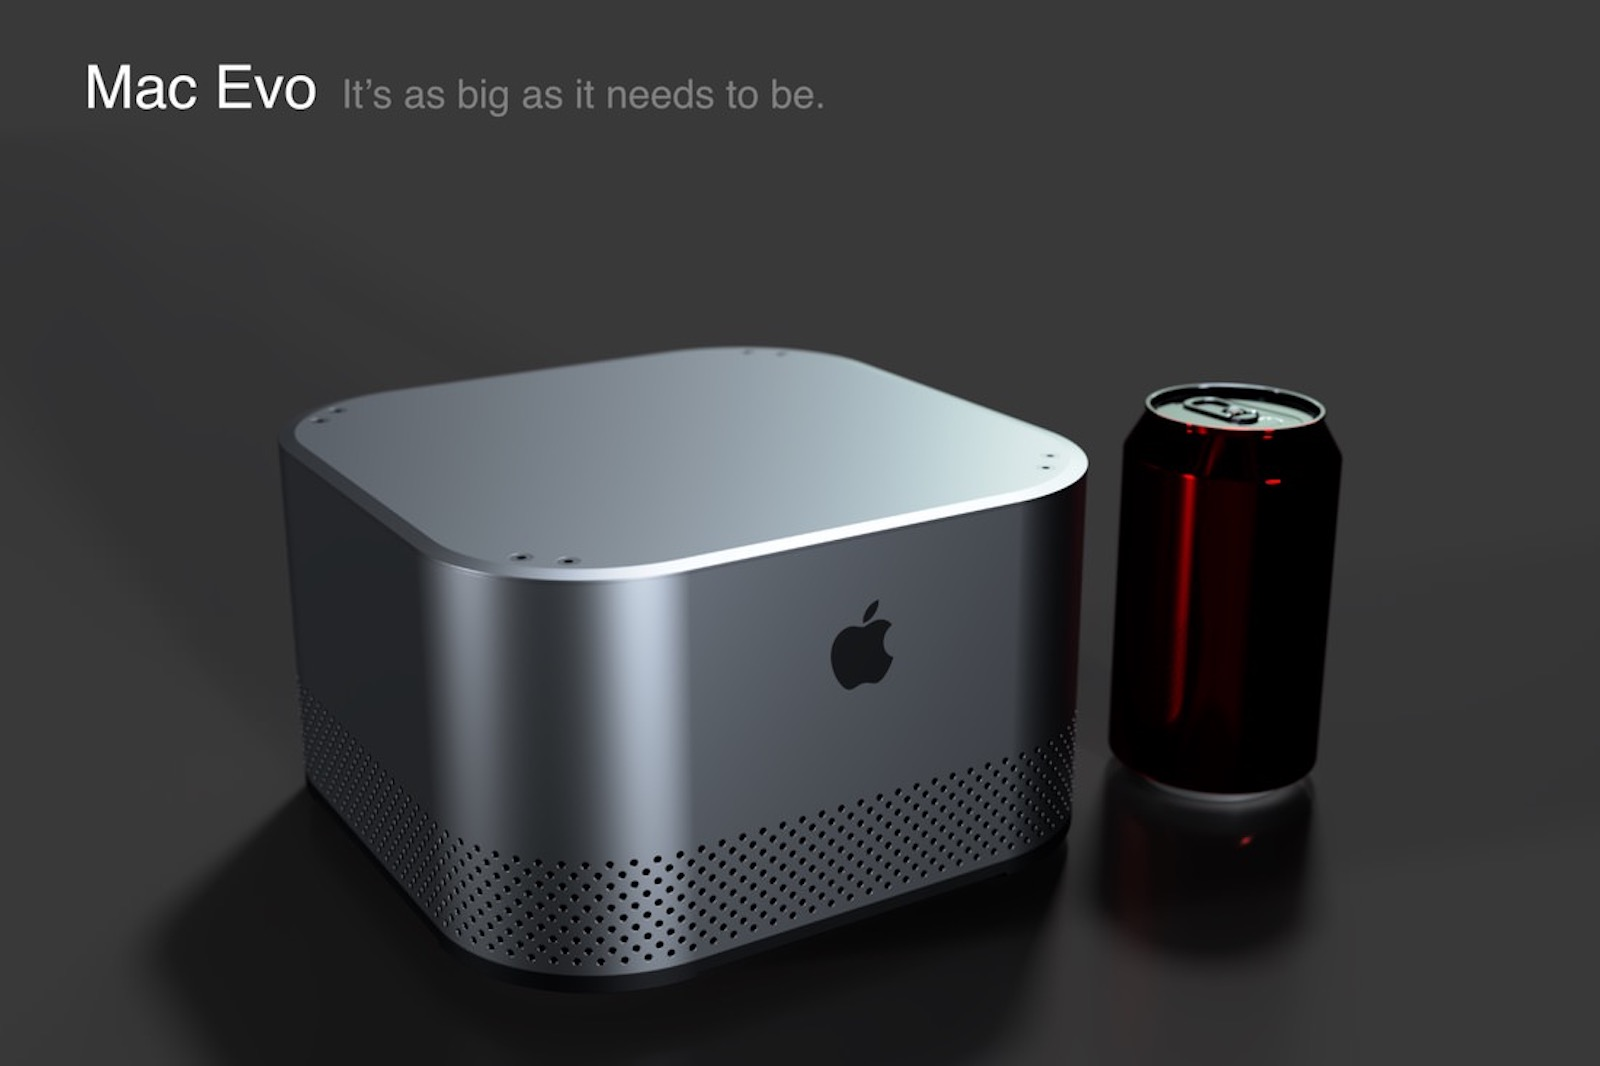 Mac Evo Concept image 1